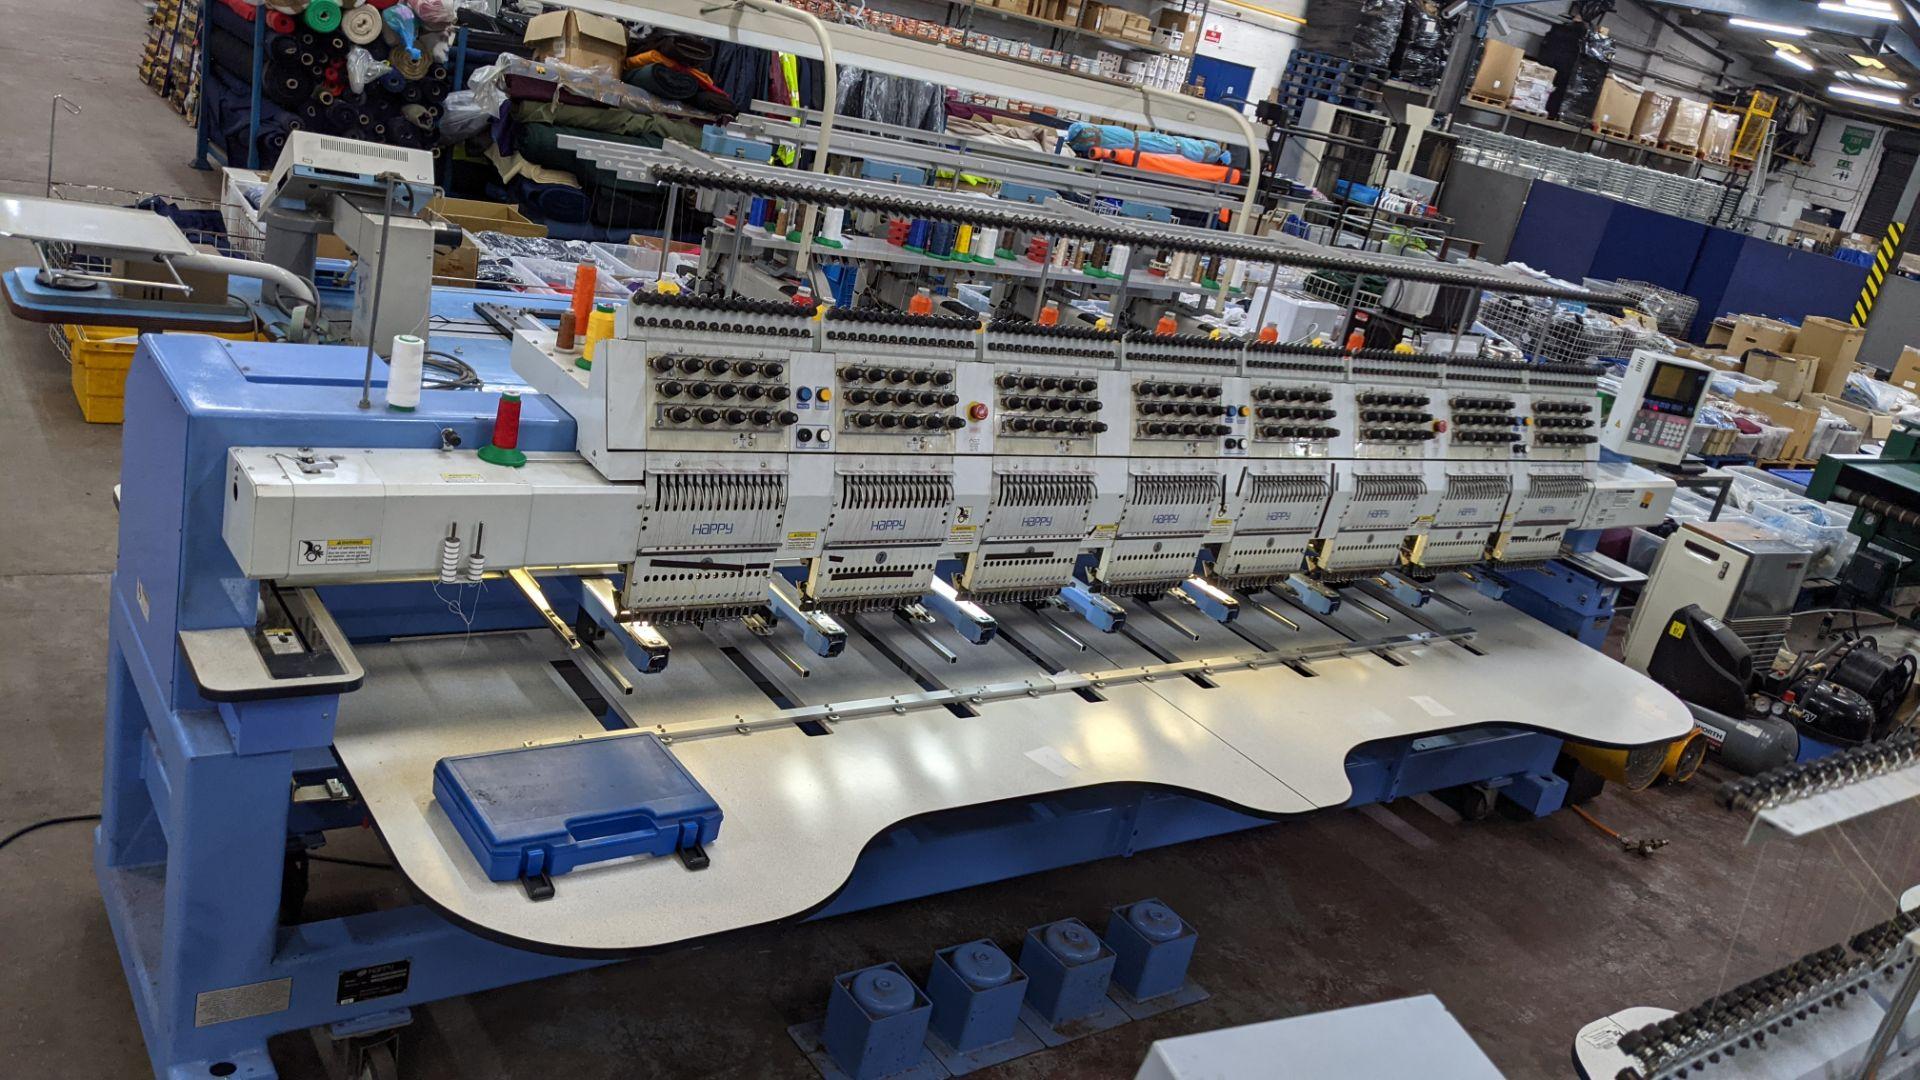 Happy 8 head embroidery machine, model HCG-1508B-45TTC, 15 needles per head, including frames & othe - Image 3 of 32